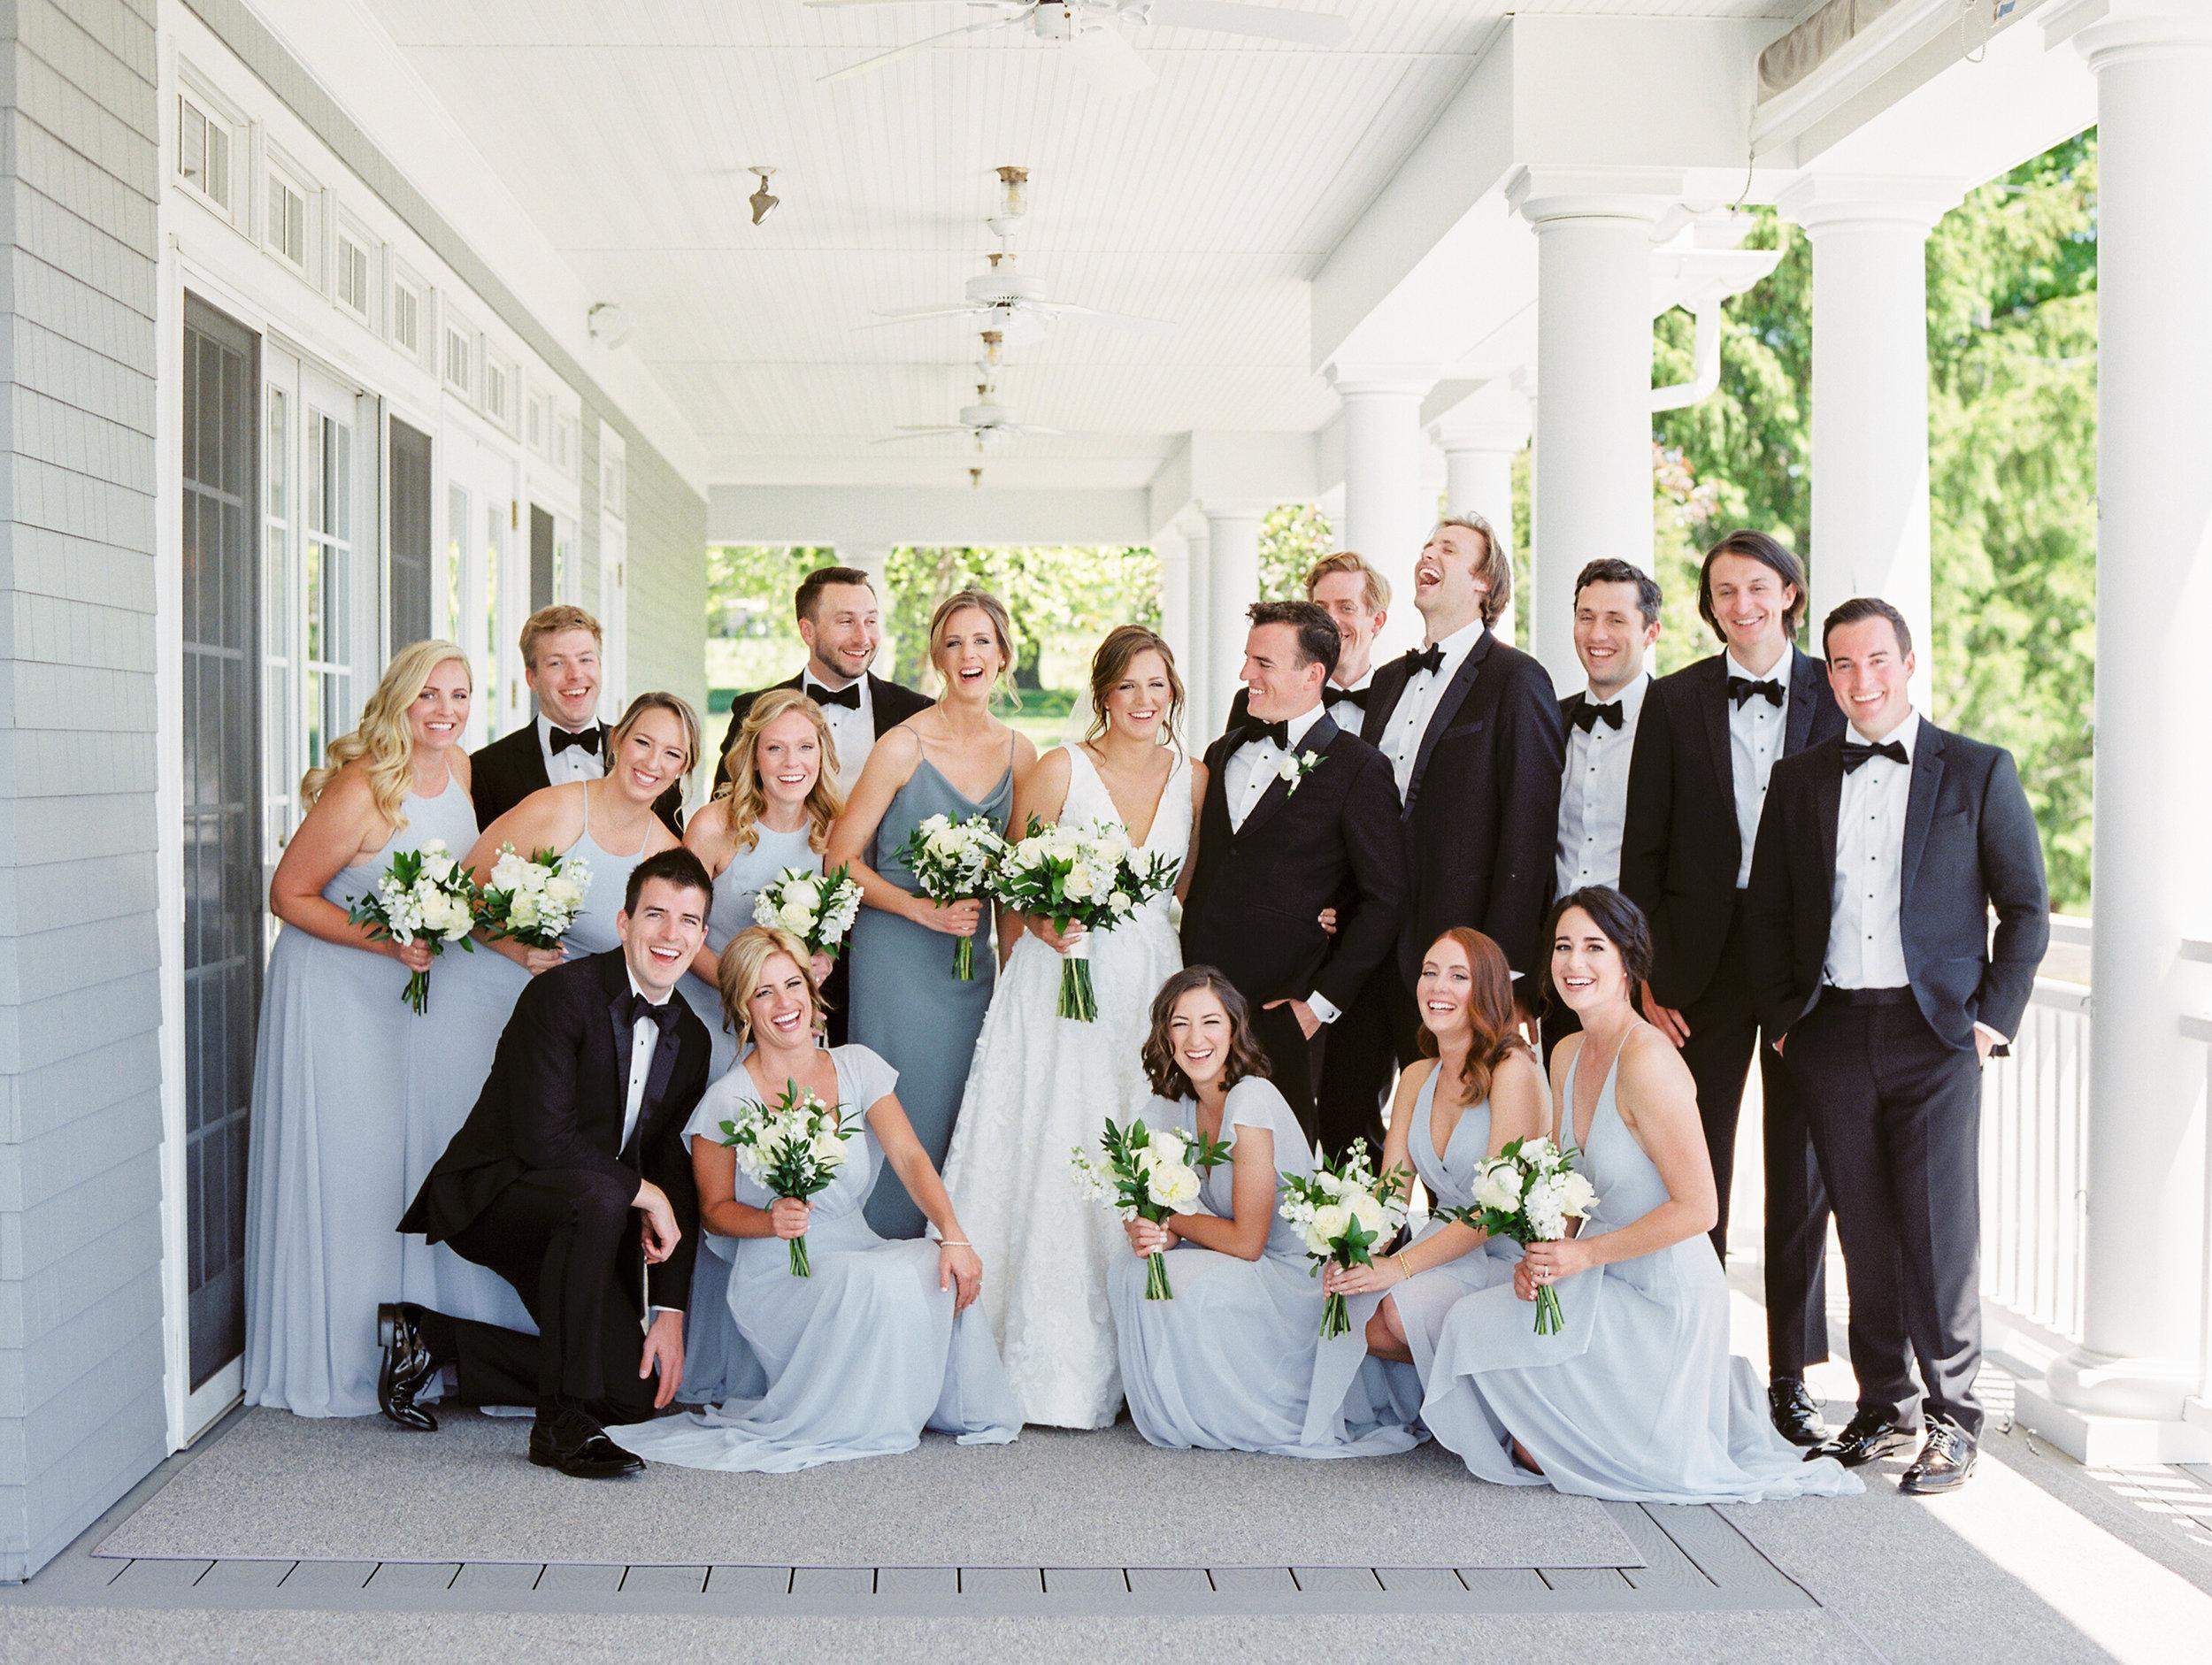 DeGuilio+Wedding+Bridal+Partyf-71.jpg